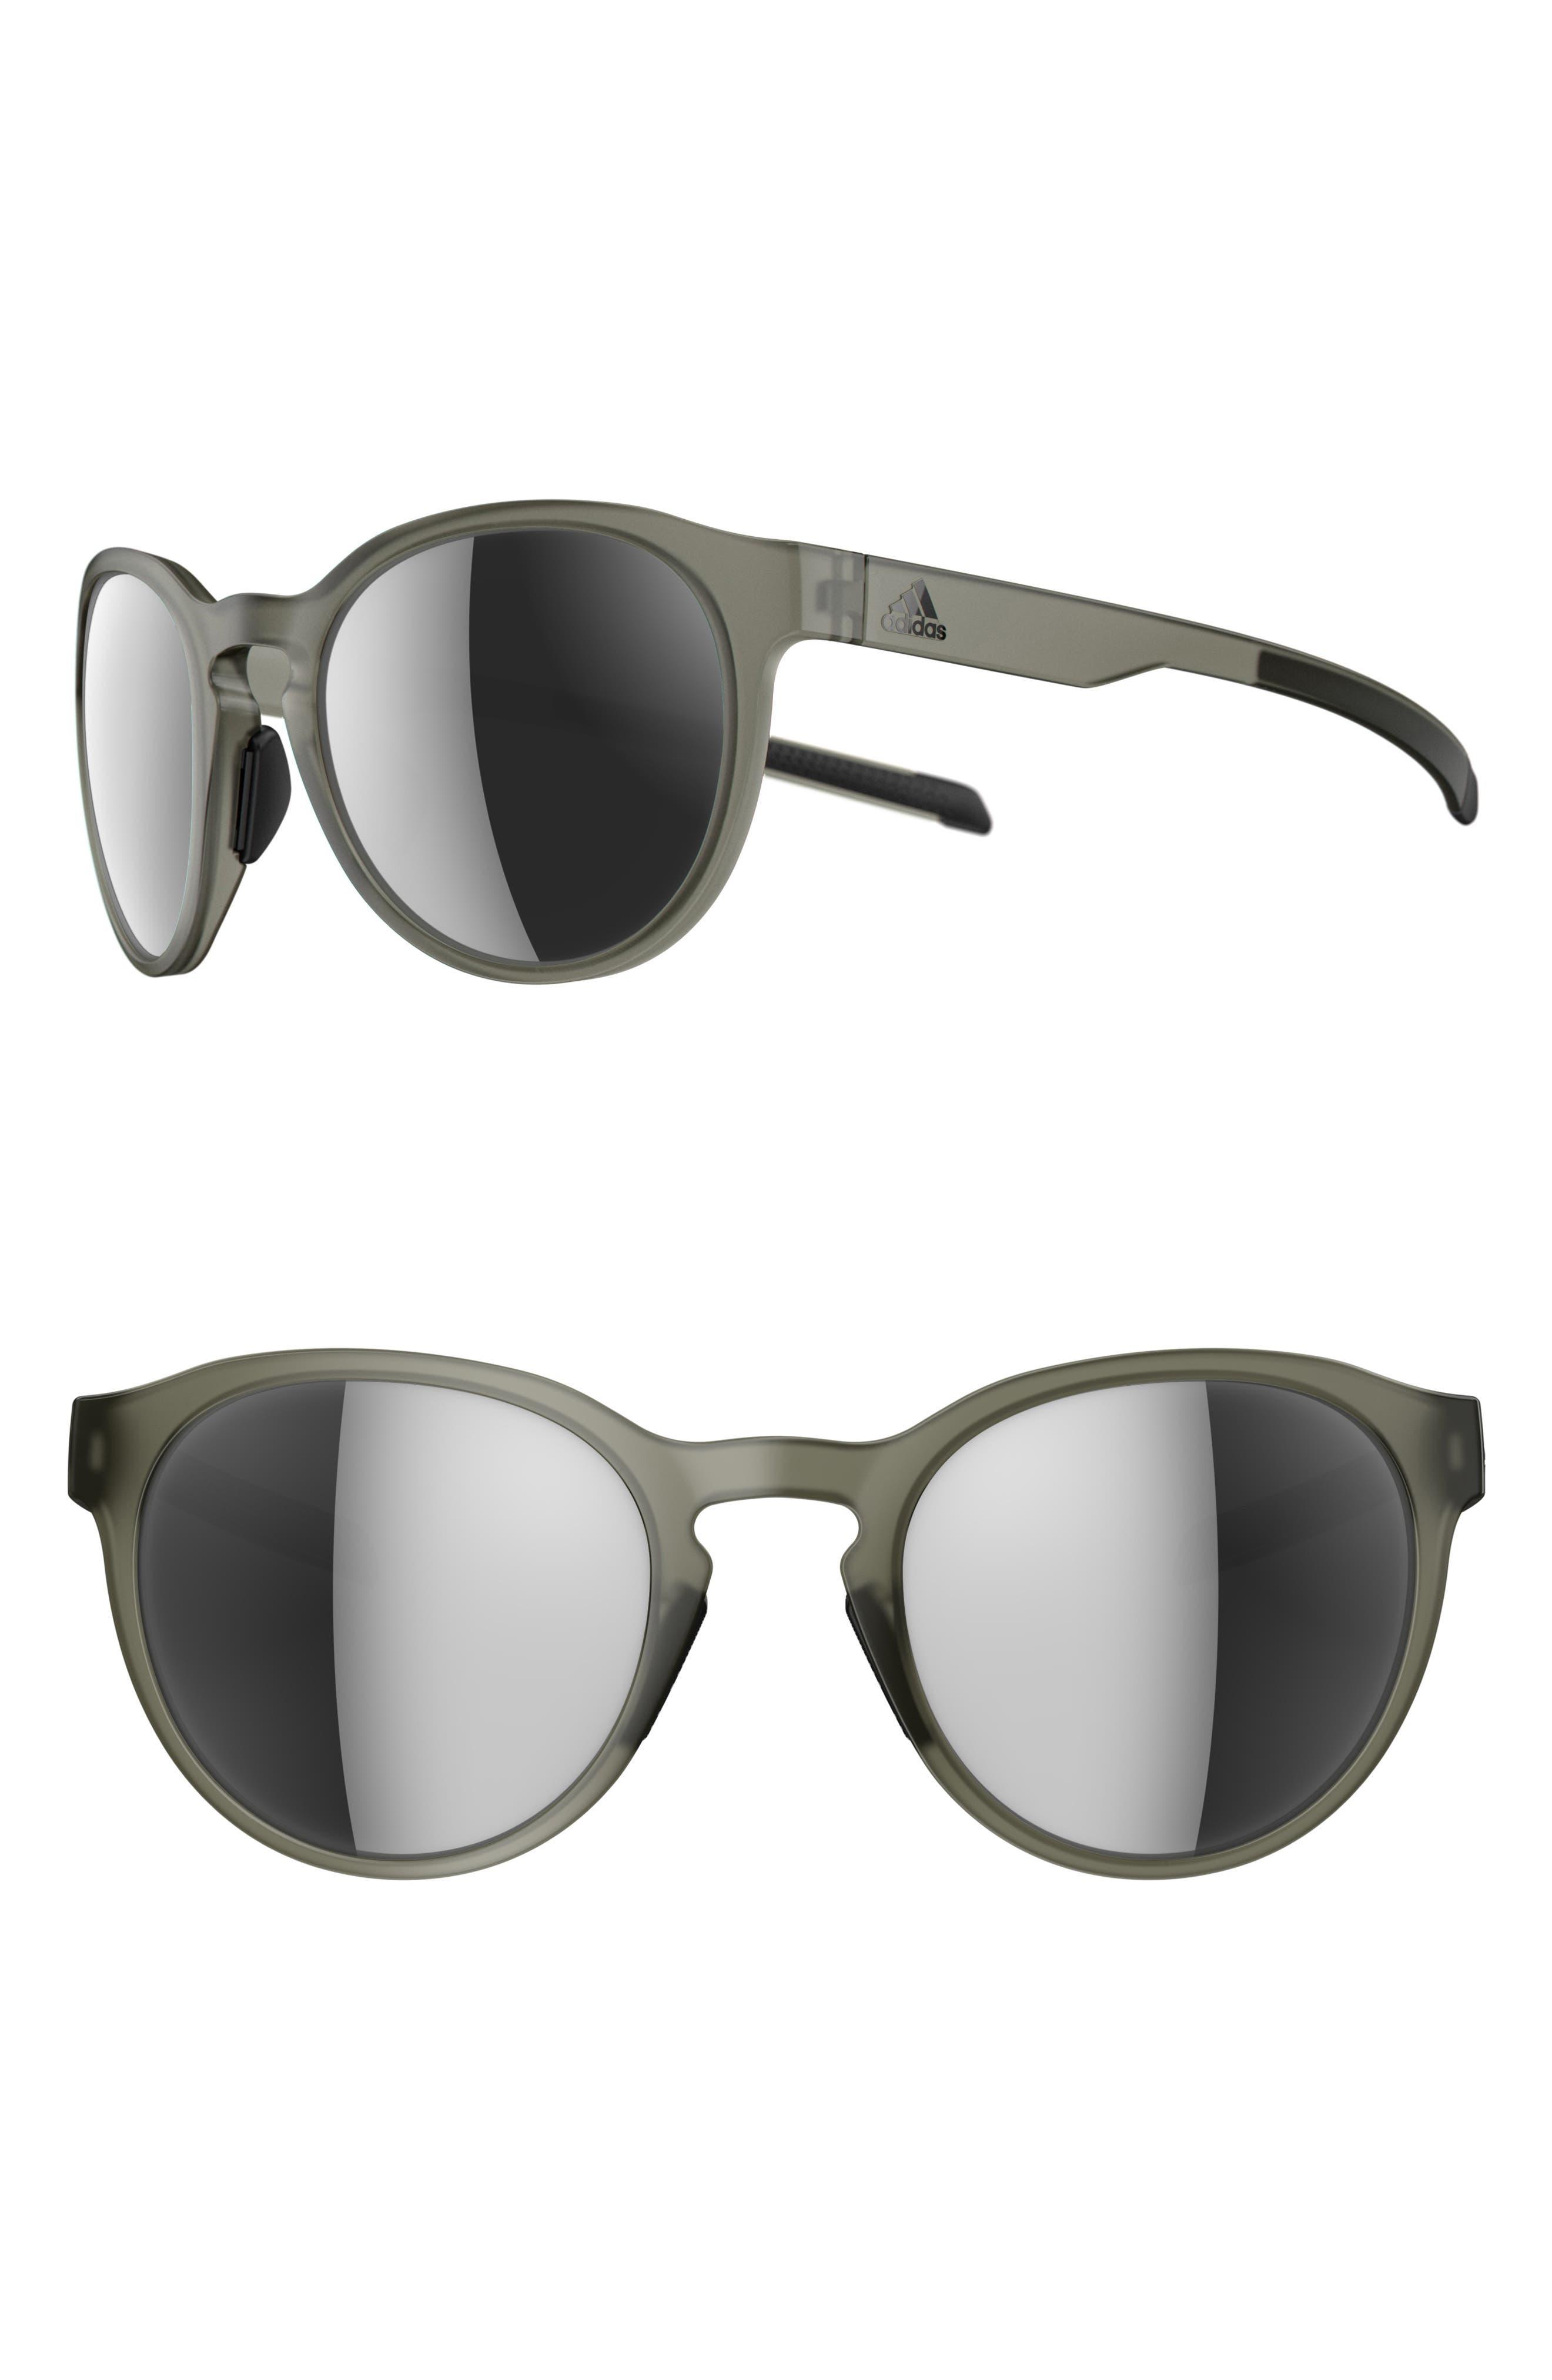 Proshift 52mm Mirrored Sport Sunglasses,                             Main thumbnail 1, color,                             MATTE OLIVE/ CHROME